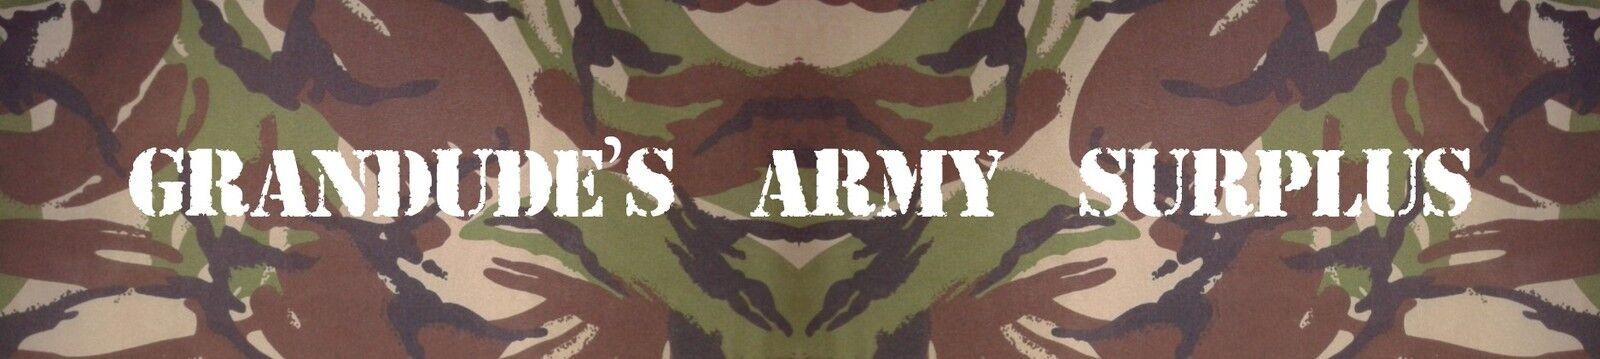 grandudes-army-surplus